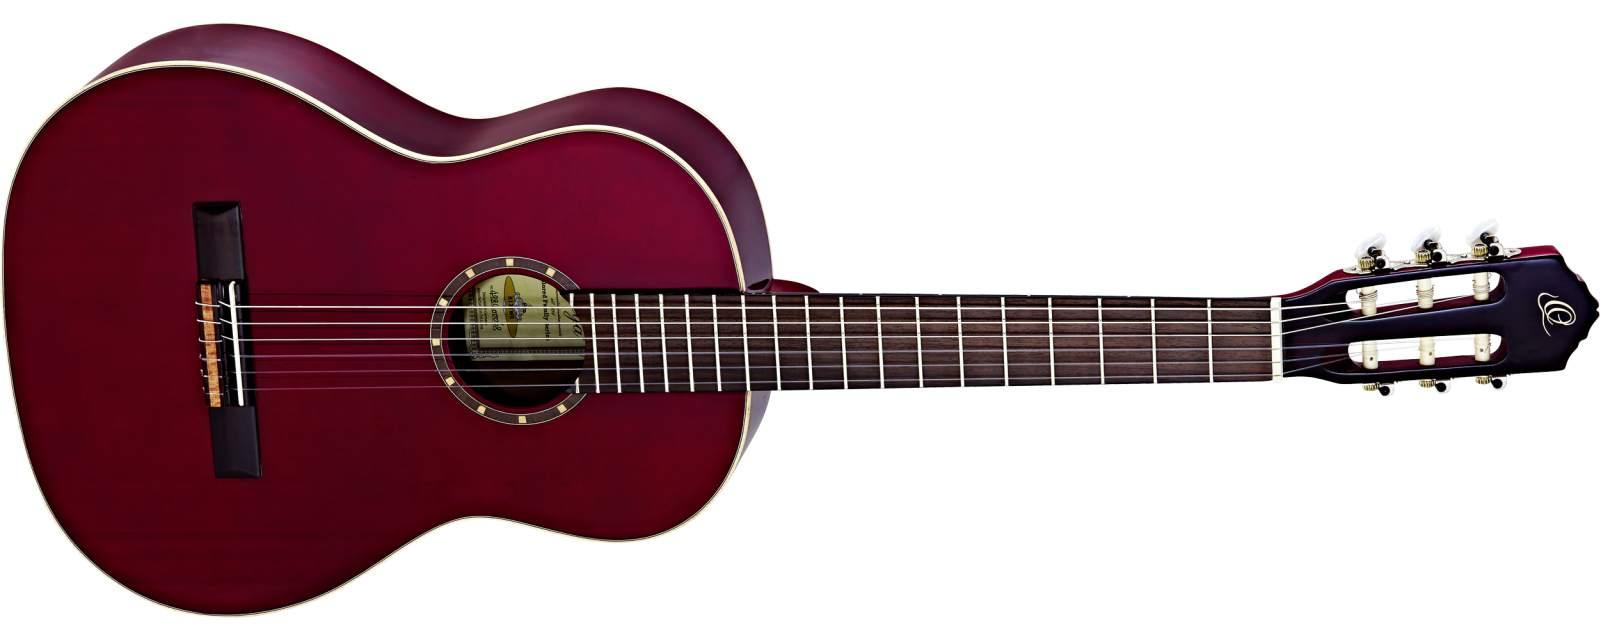 Ortega R131 WR 4/4 Konzertgitarre inkl. Bag